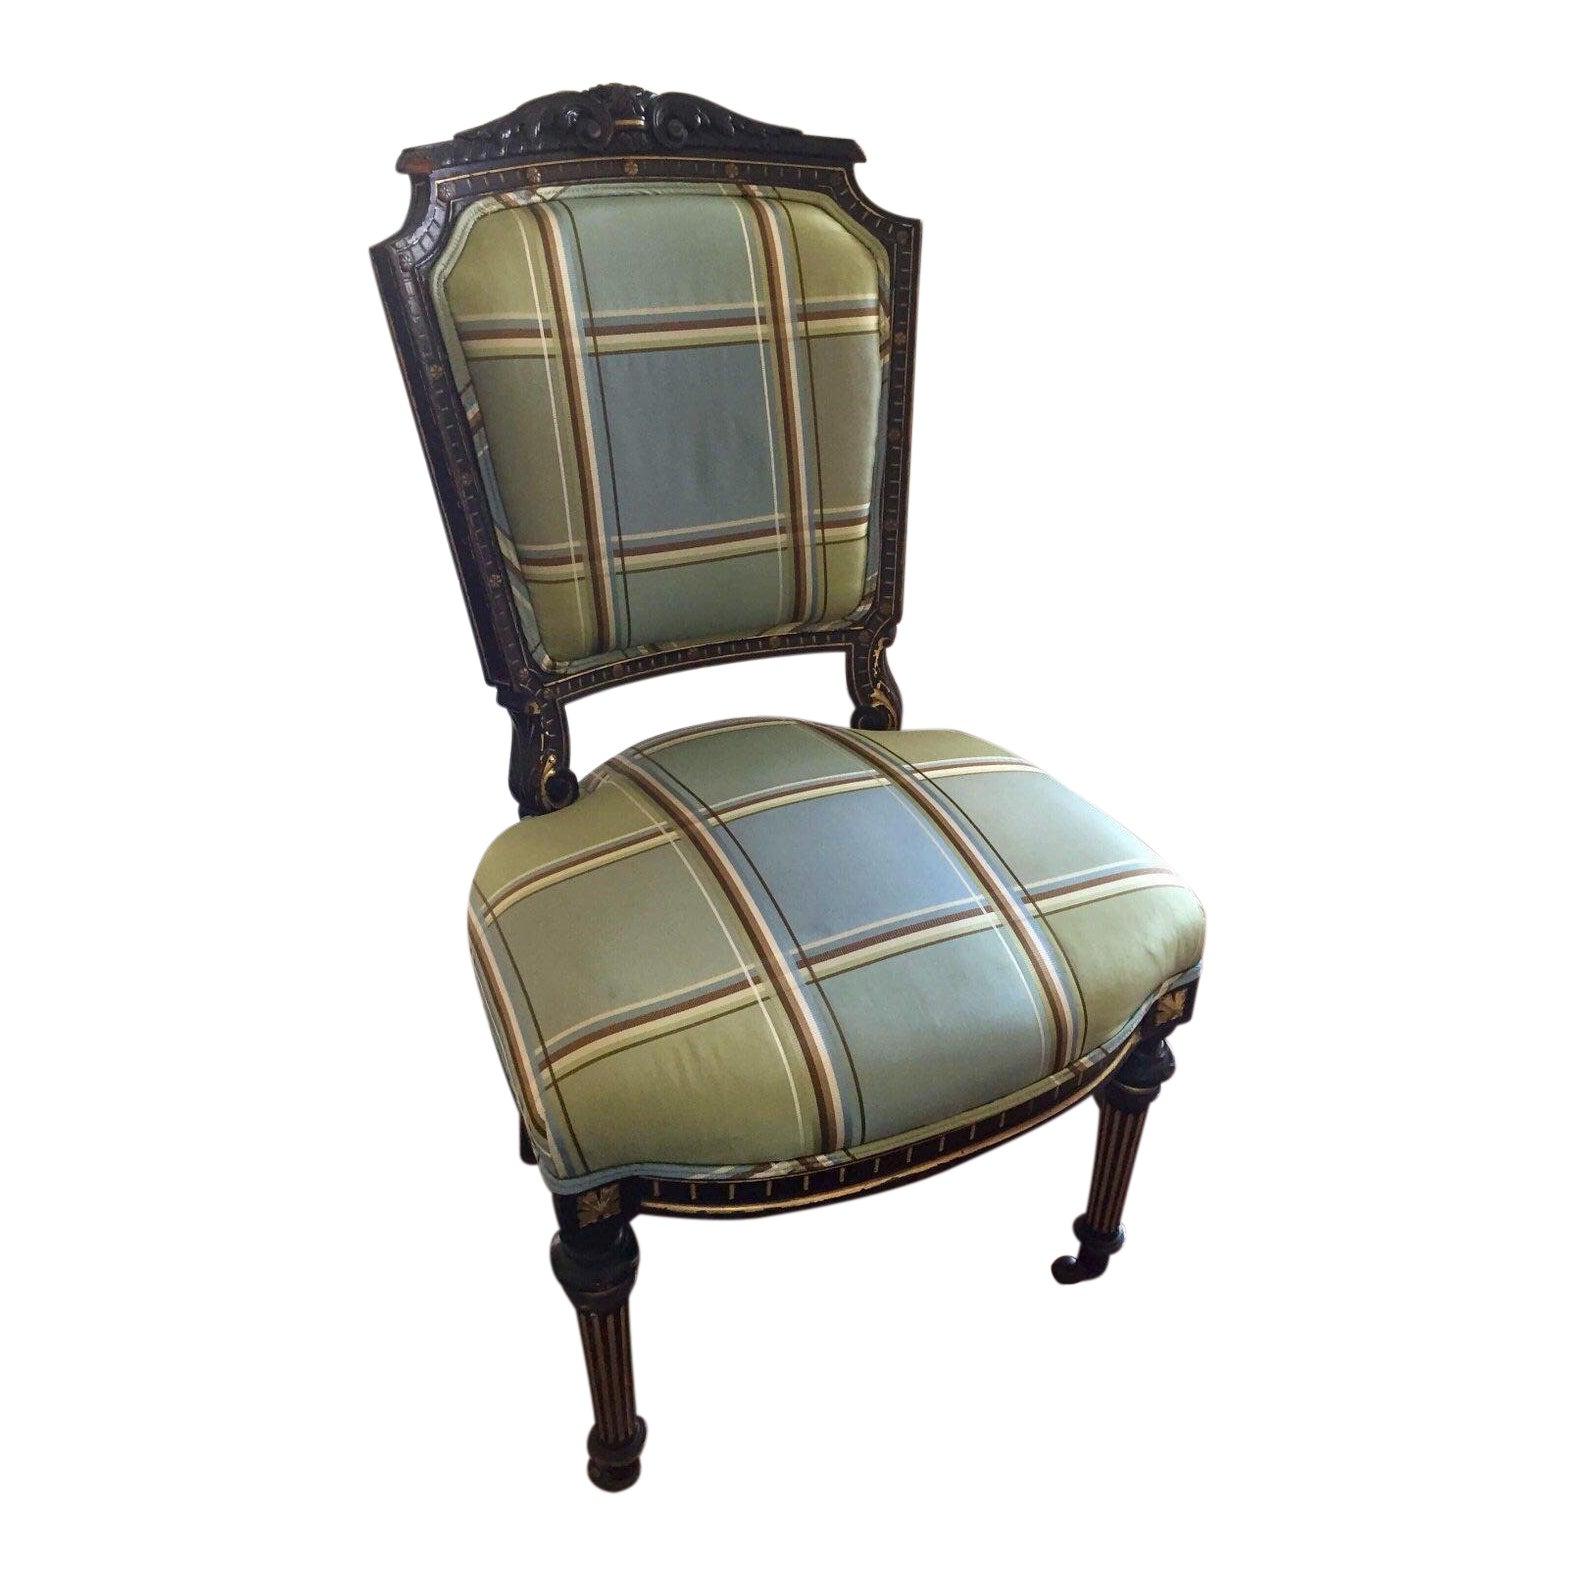 Antique empire style accent desk chair chairish